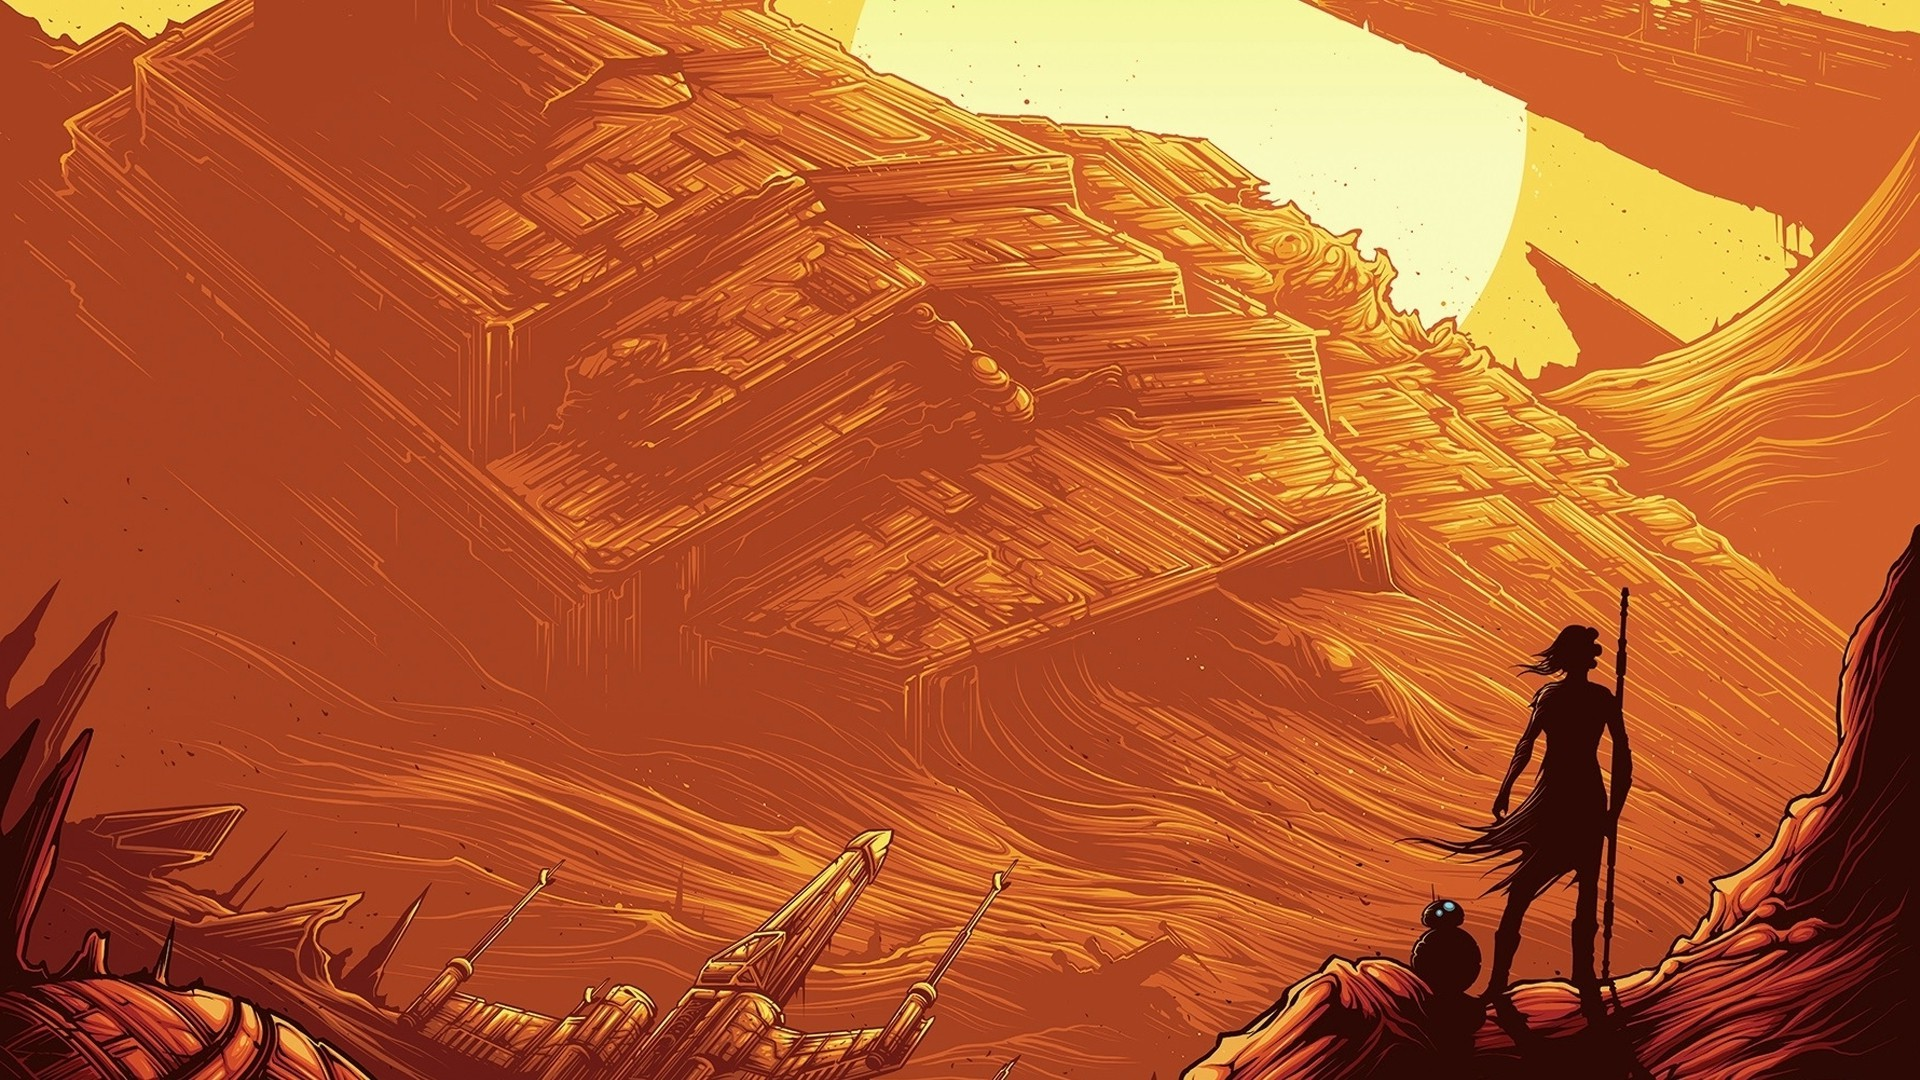 Star Wars, Star Wars: Episode VII The Force Awakens, BB 8, Star